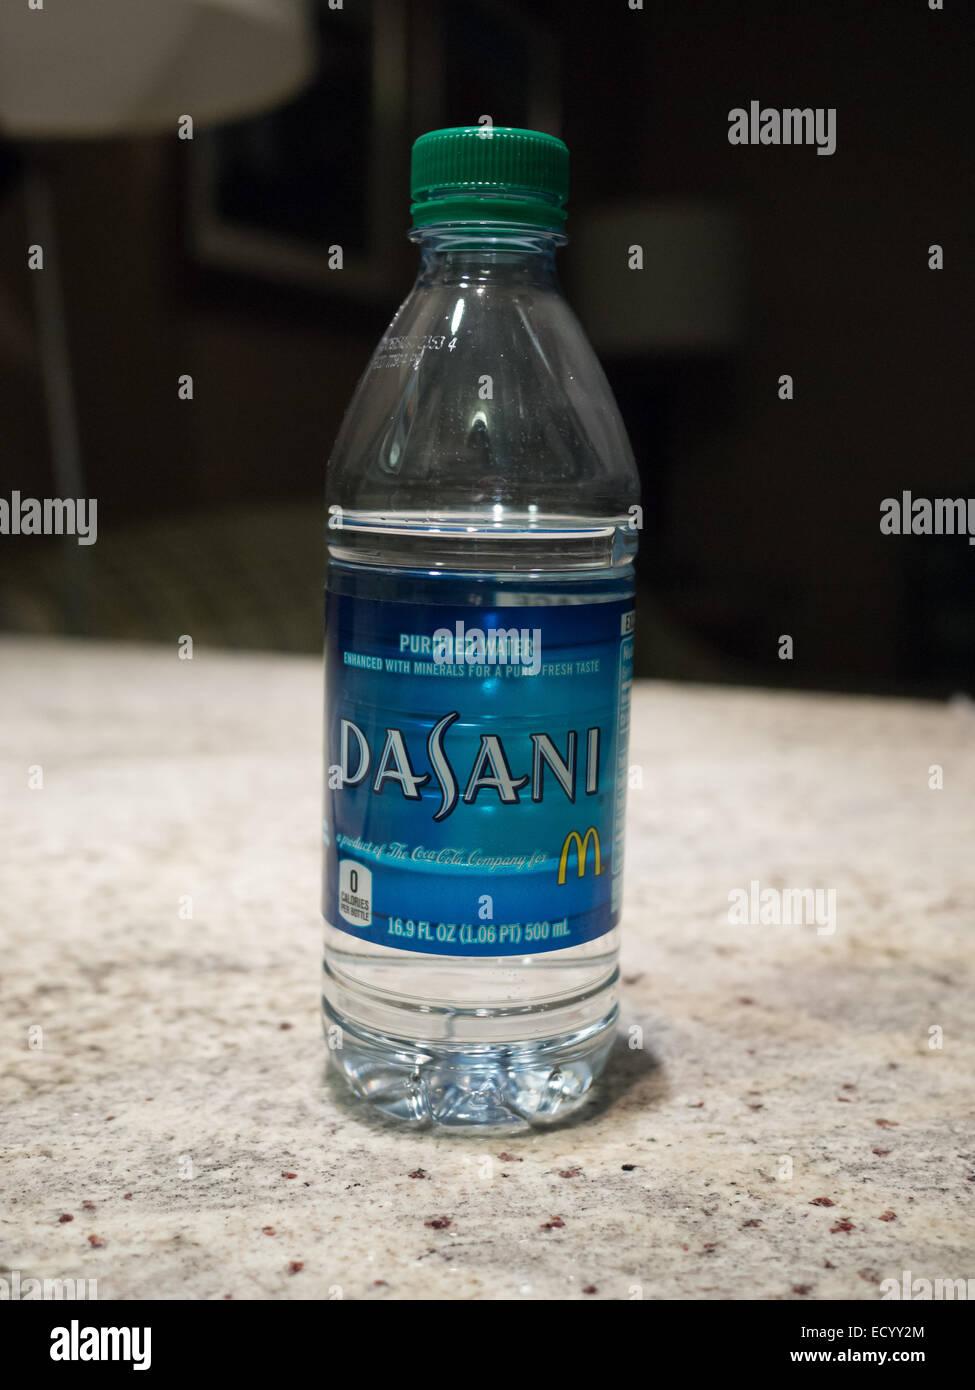 Agua embotellada Dasani Imagen De Stock